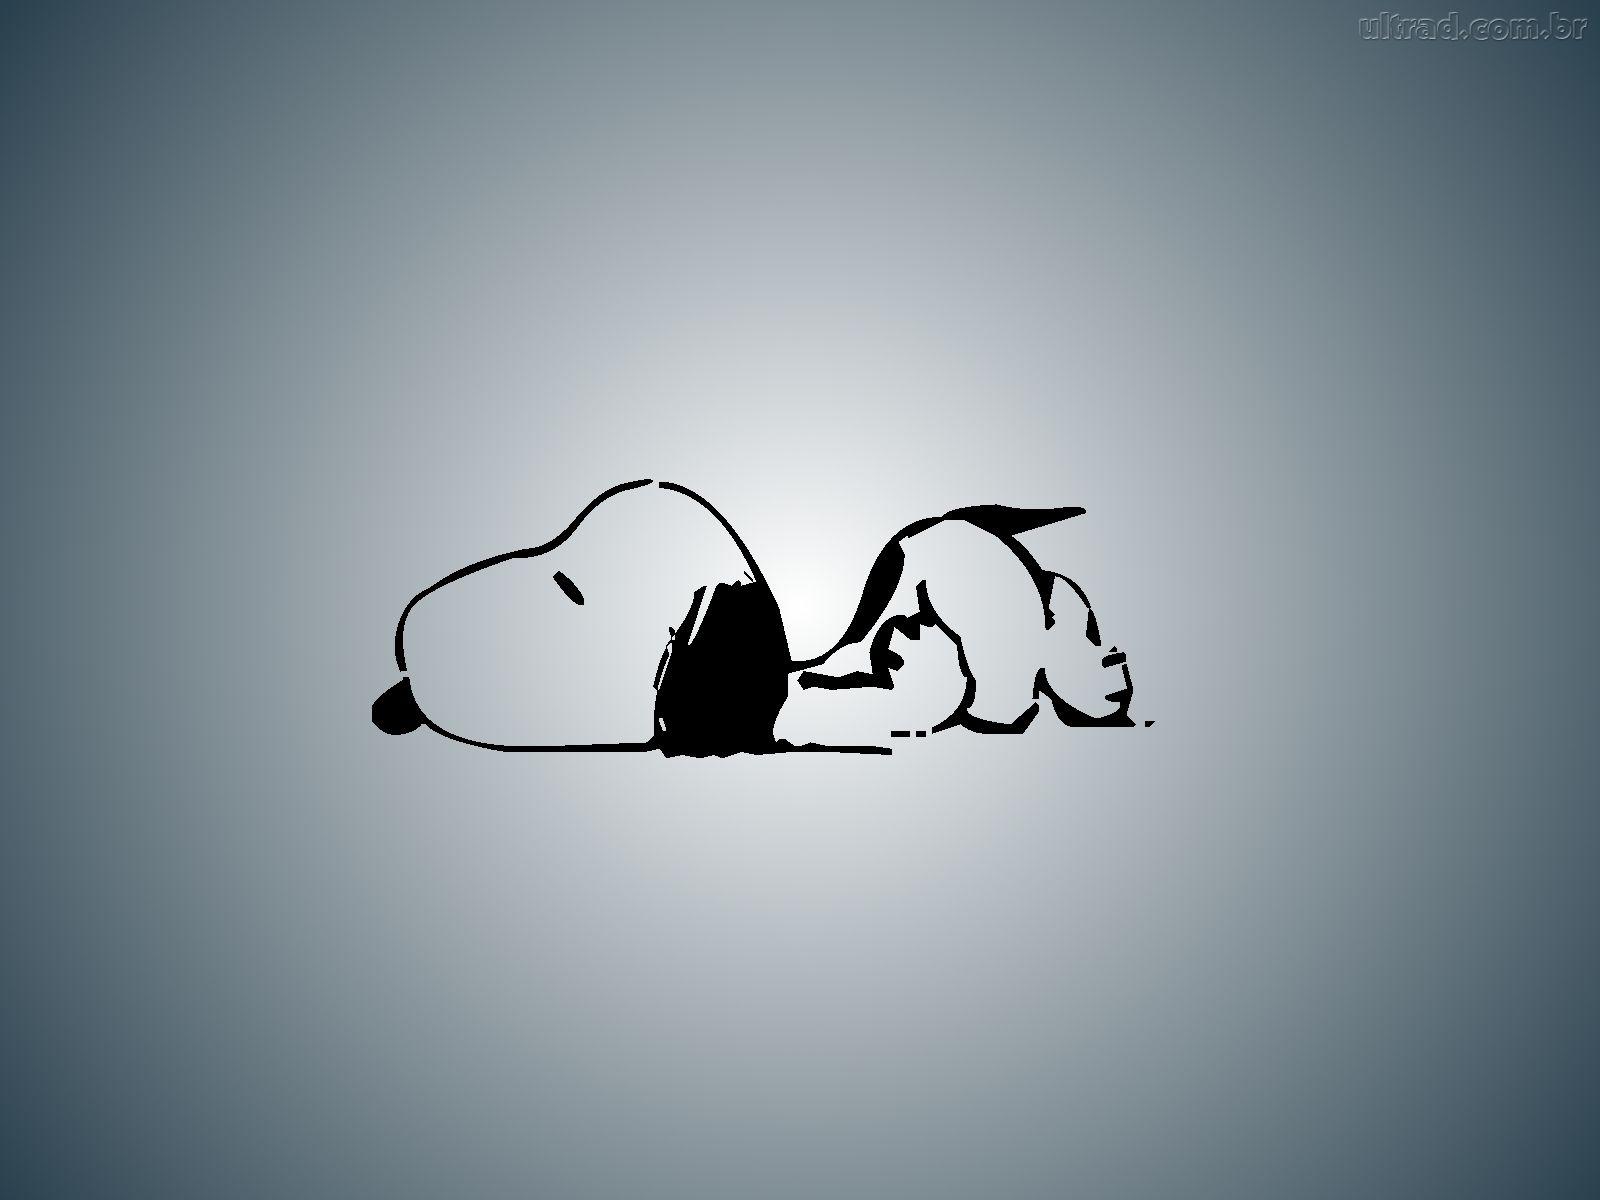 Papel De Parede Cartoon: Snoopy Wallpaper And Hintergrund